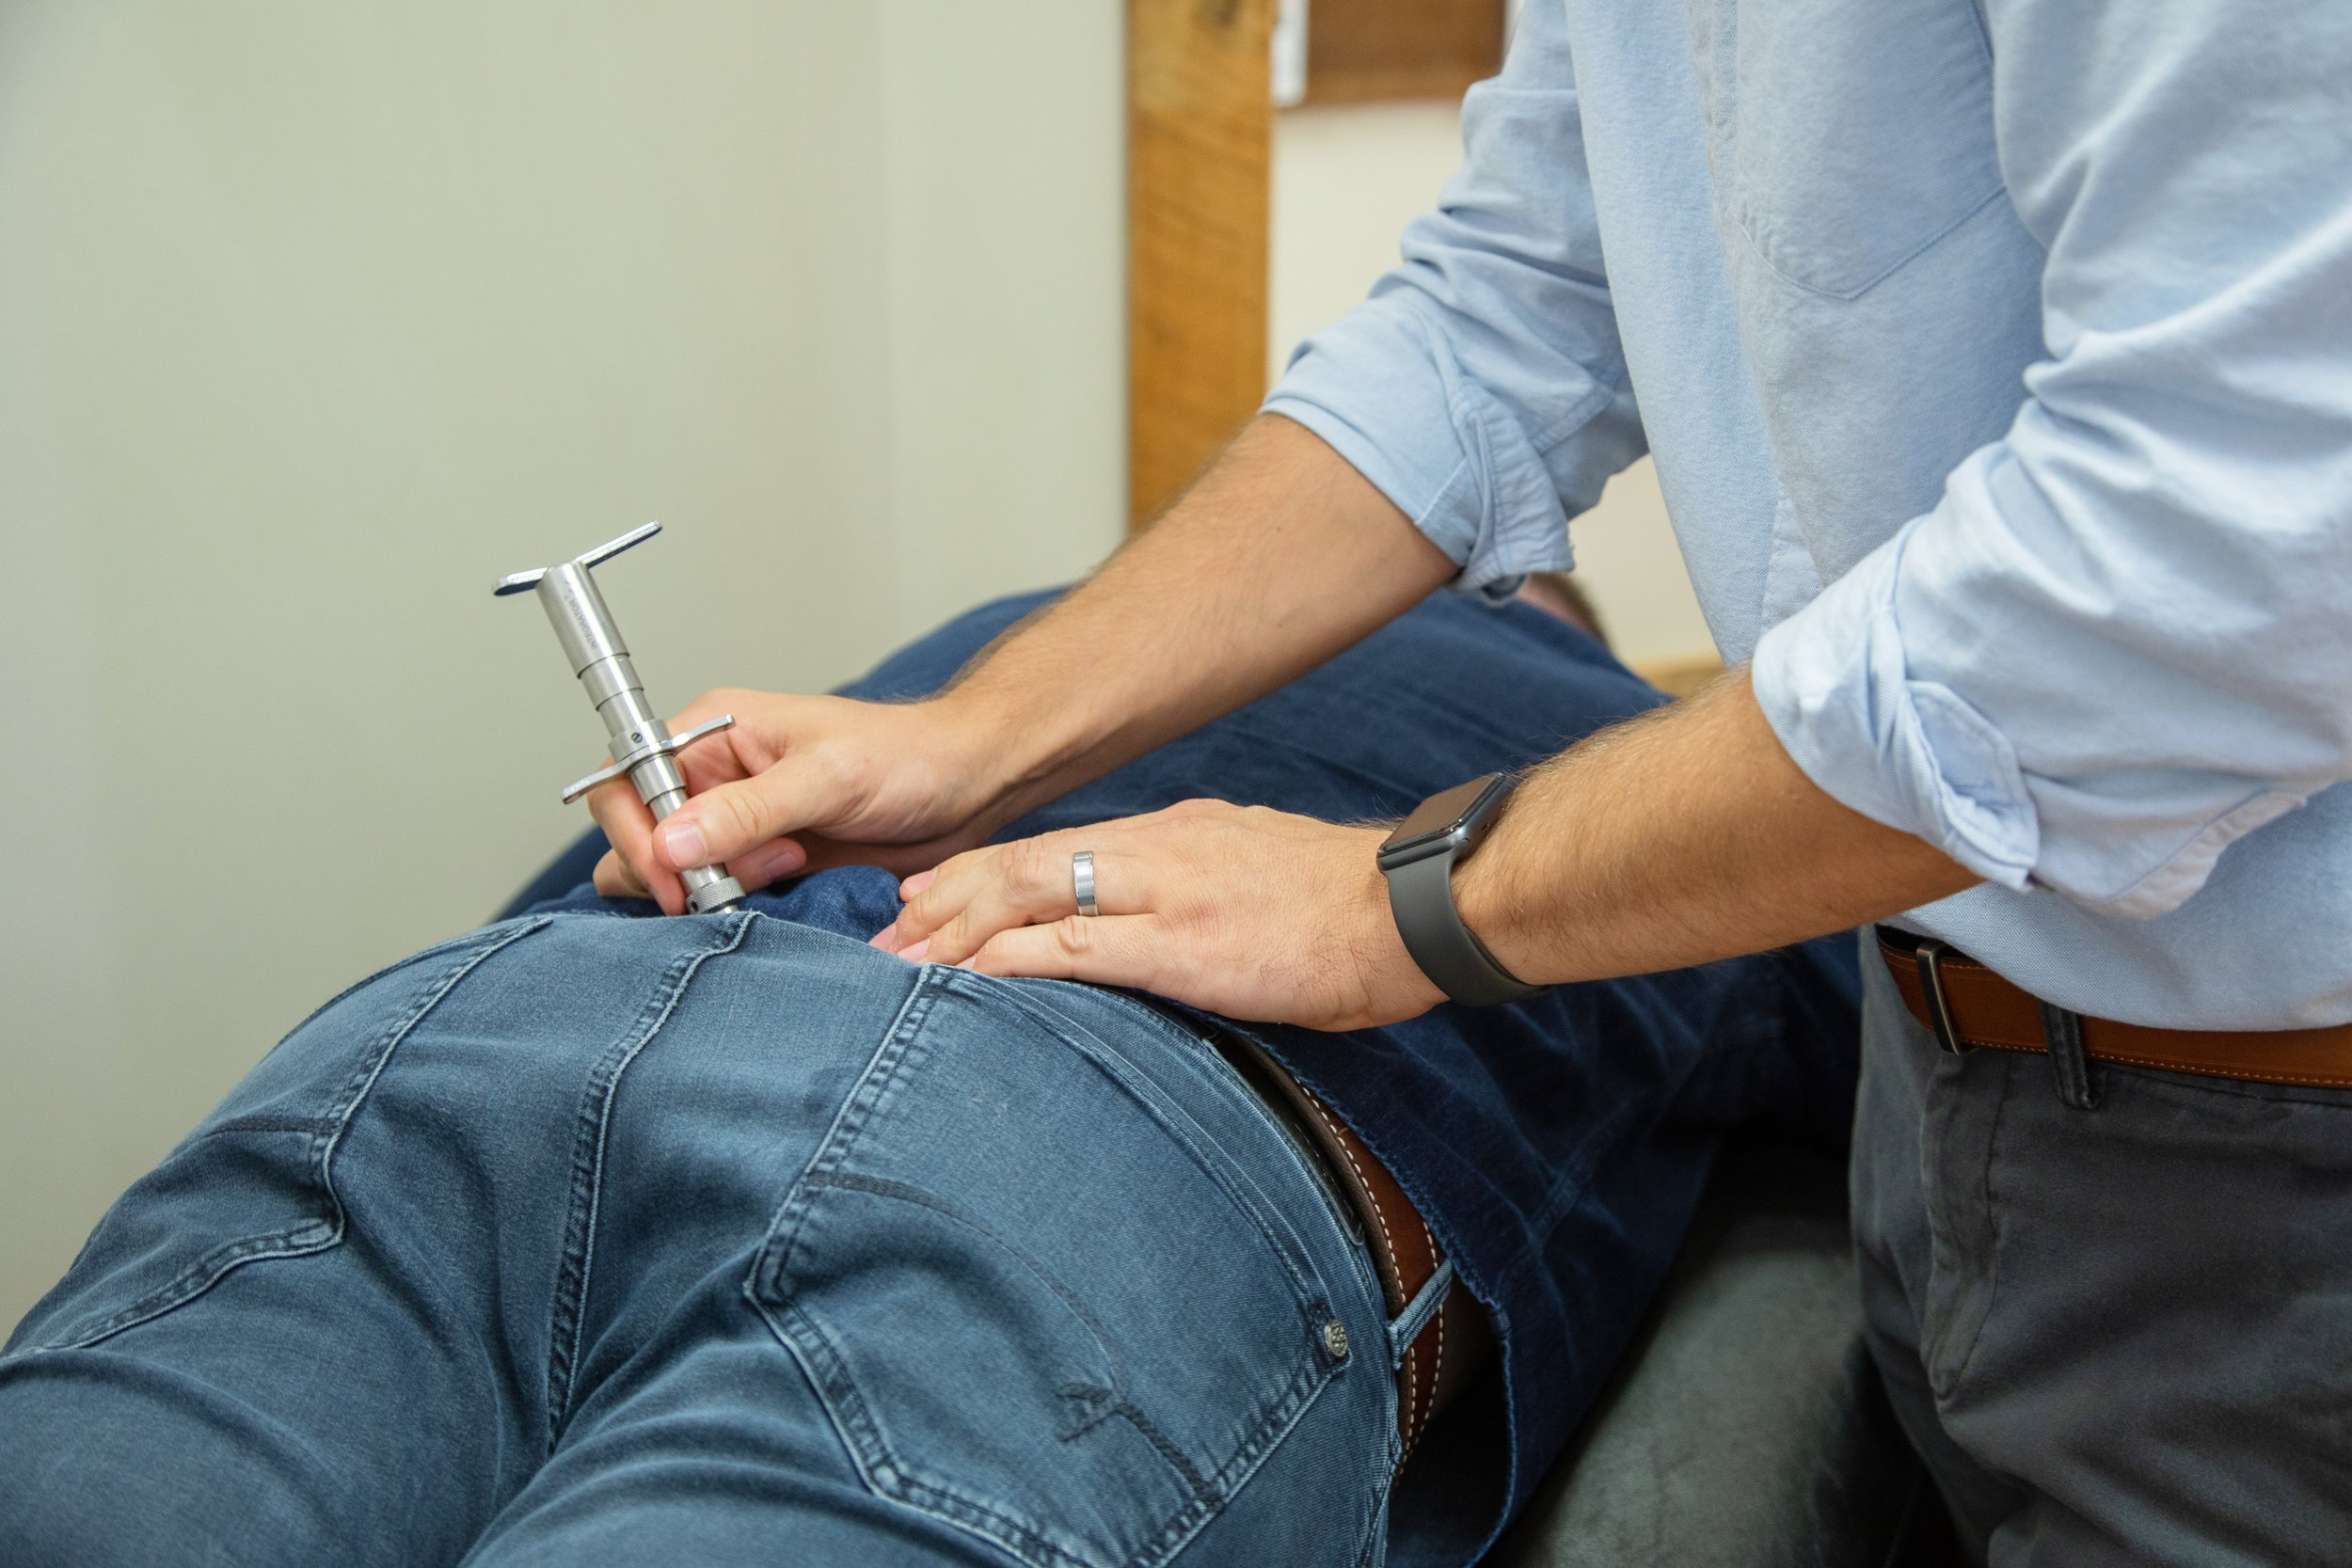 Restoration-Family-Chiropractic-trt-adjustment.jpg